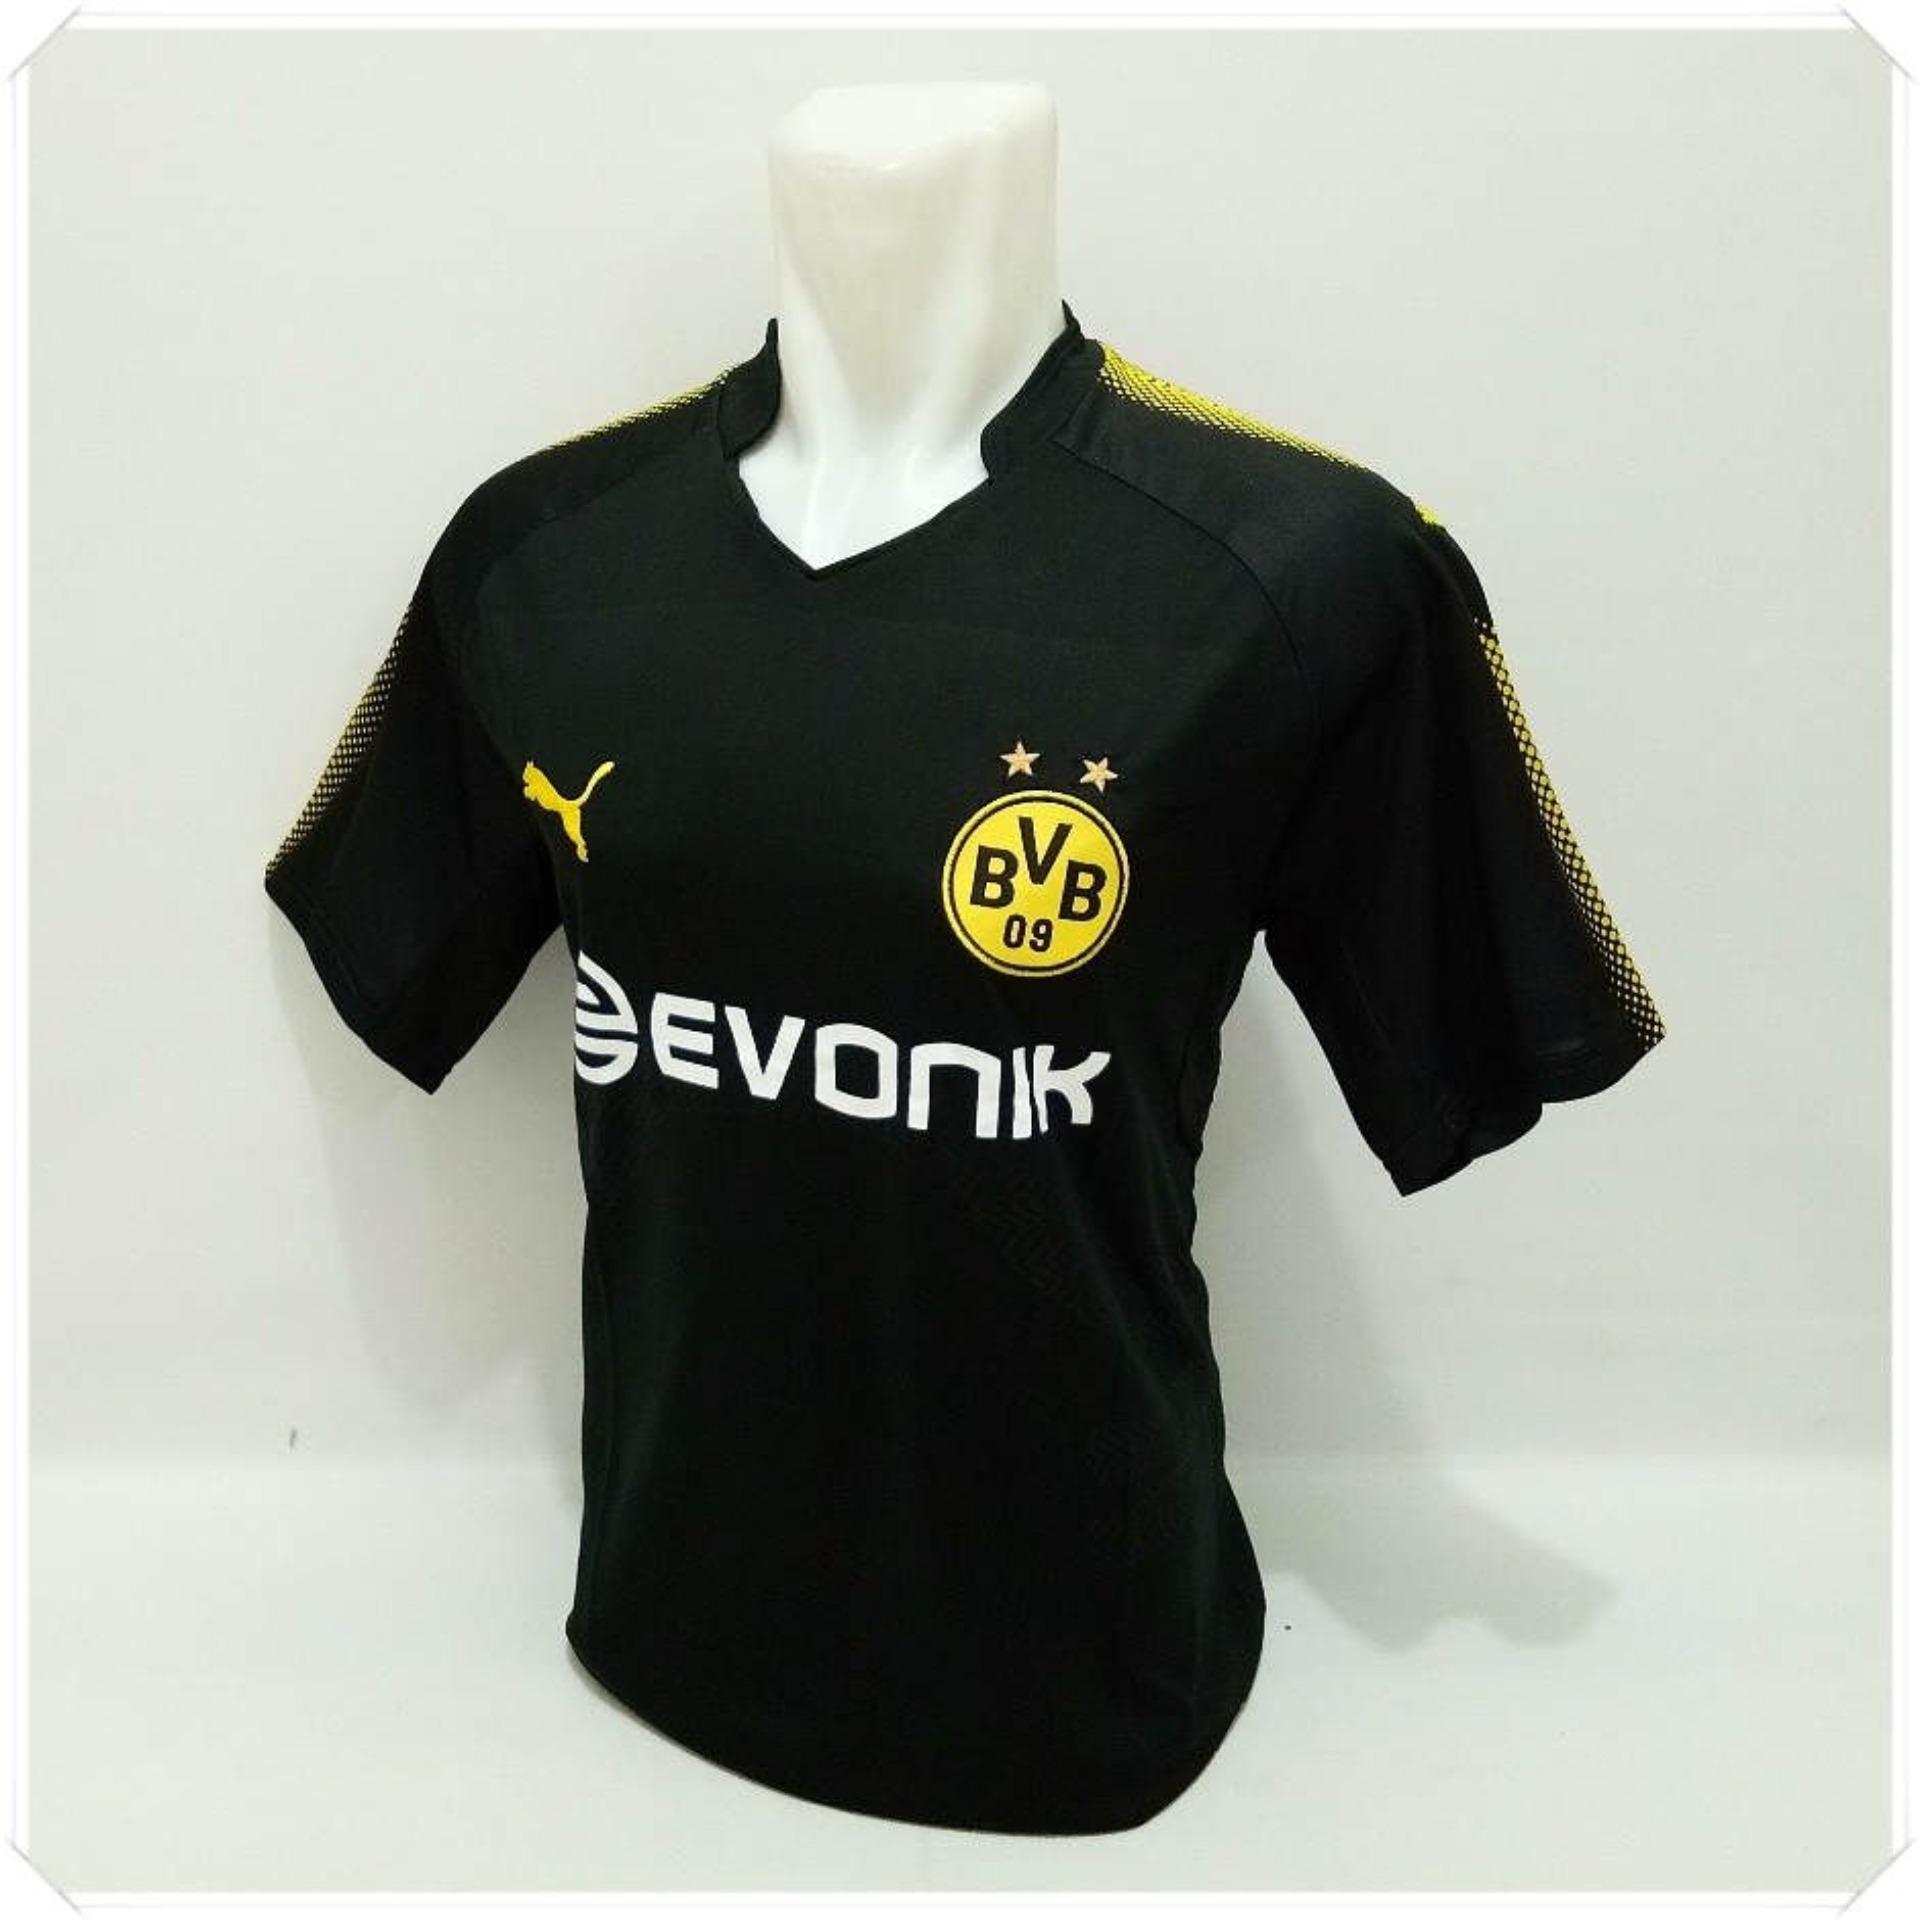 T Shirt Kaos Olahraga Bola Baju Bola Pakaian Pria Sport Atasan Pria Football Futsal Jersey Bola Murah Dortmund Away Asli